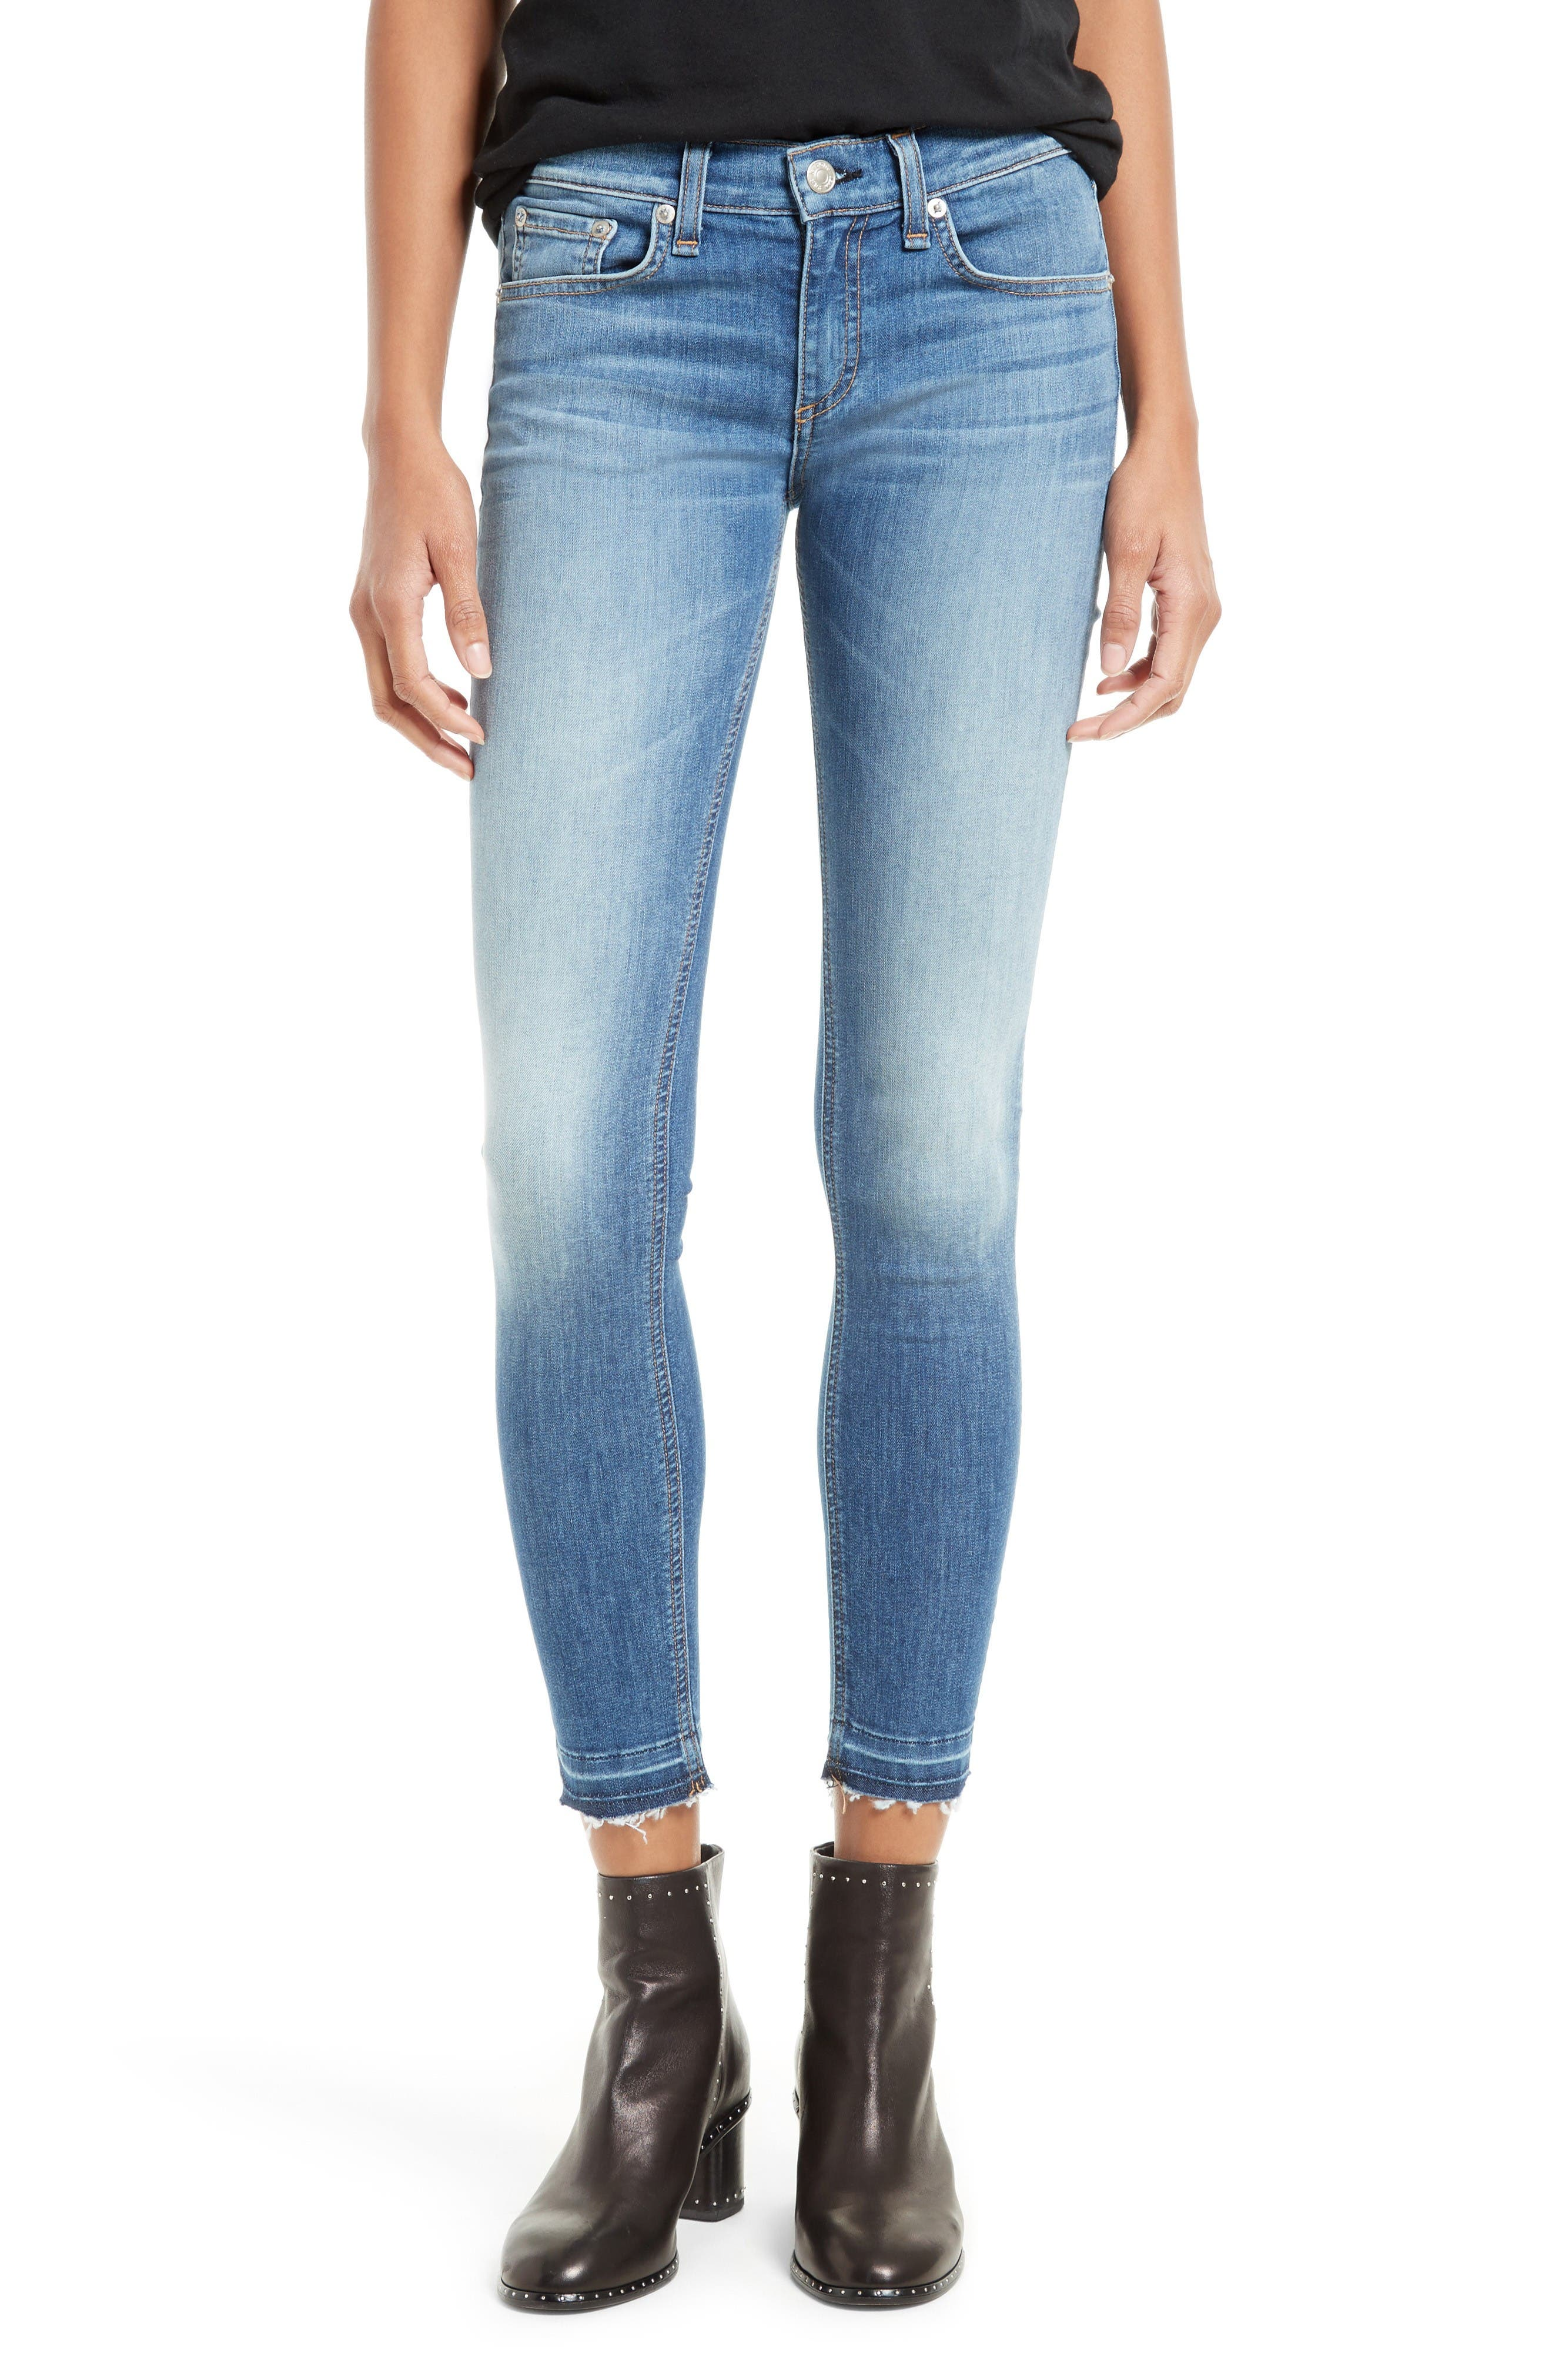 Main Image - rag & bone/JEAN Capri Skinny Jeans (Clean Lilly Dale)